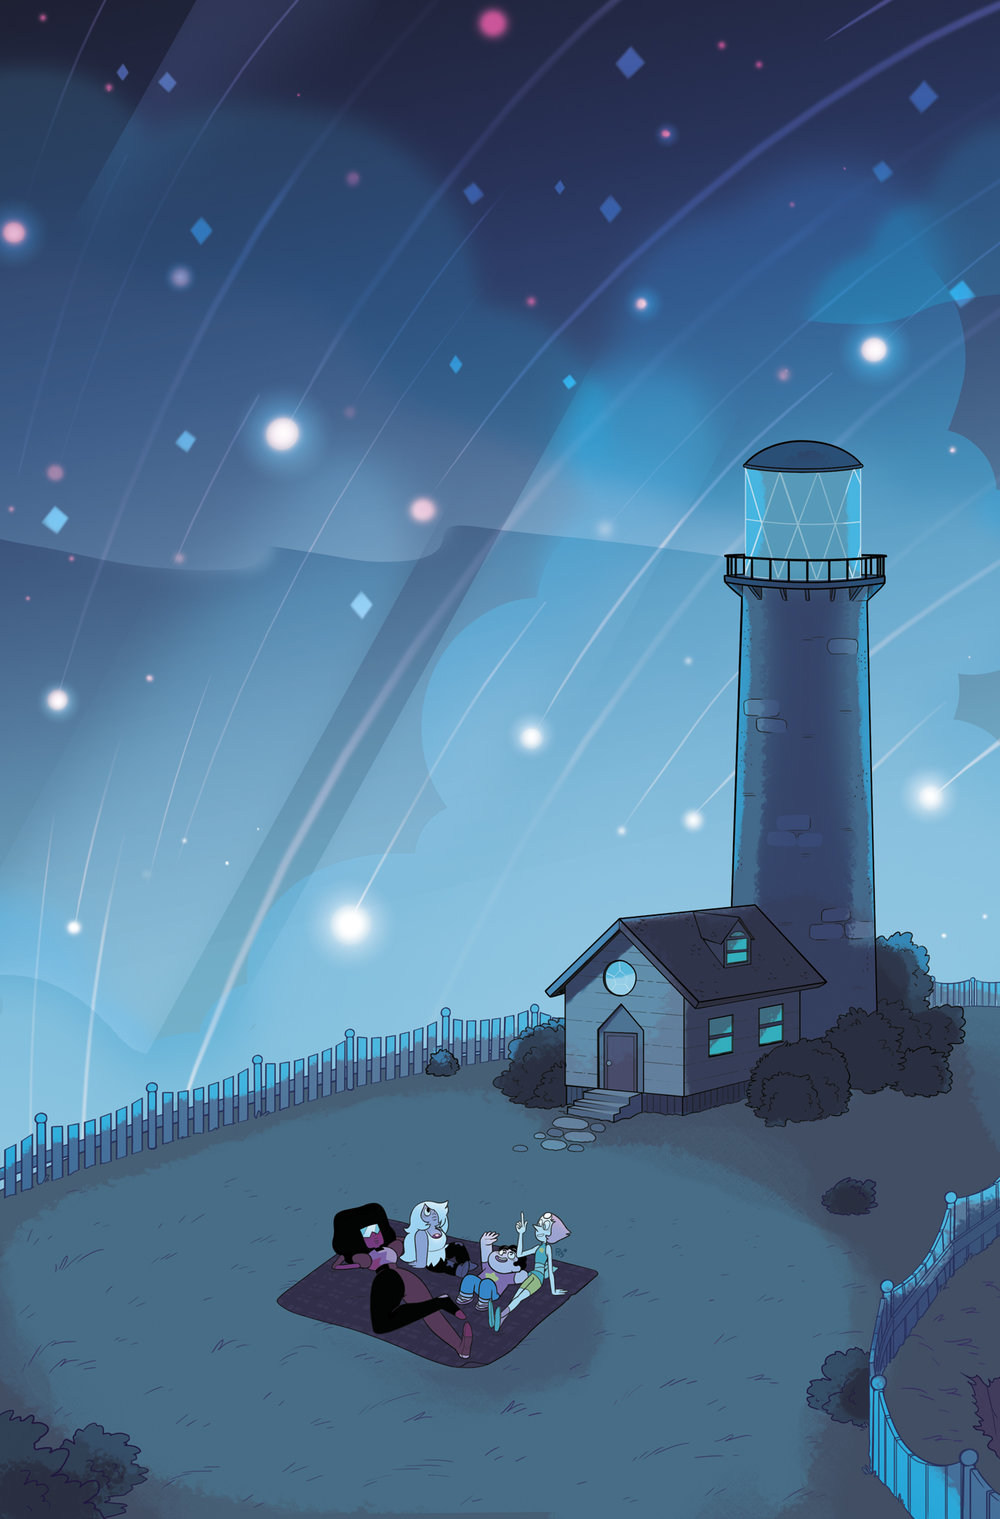 Steven Universe_cover2_Sygh.jpg